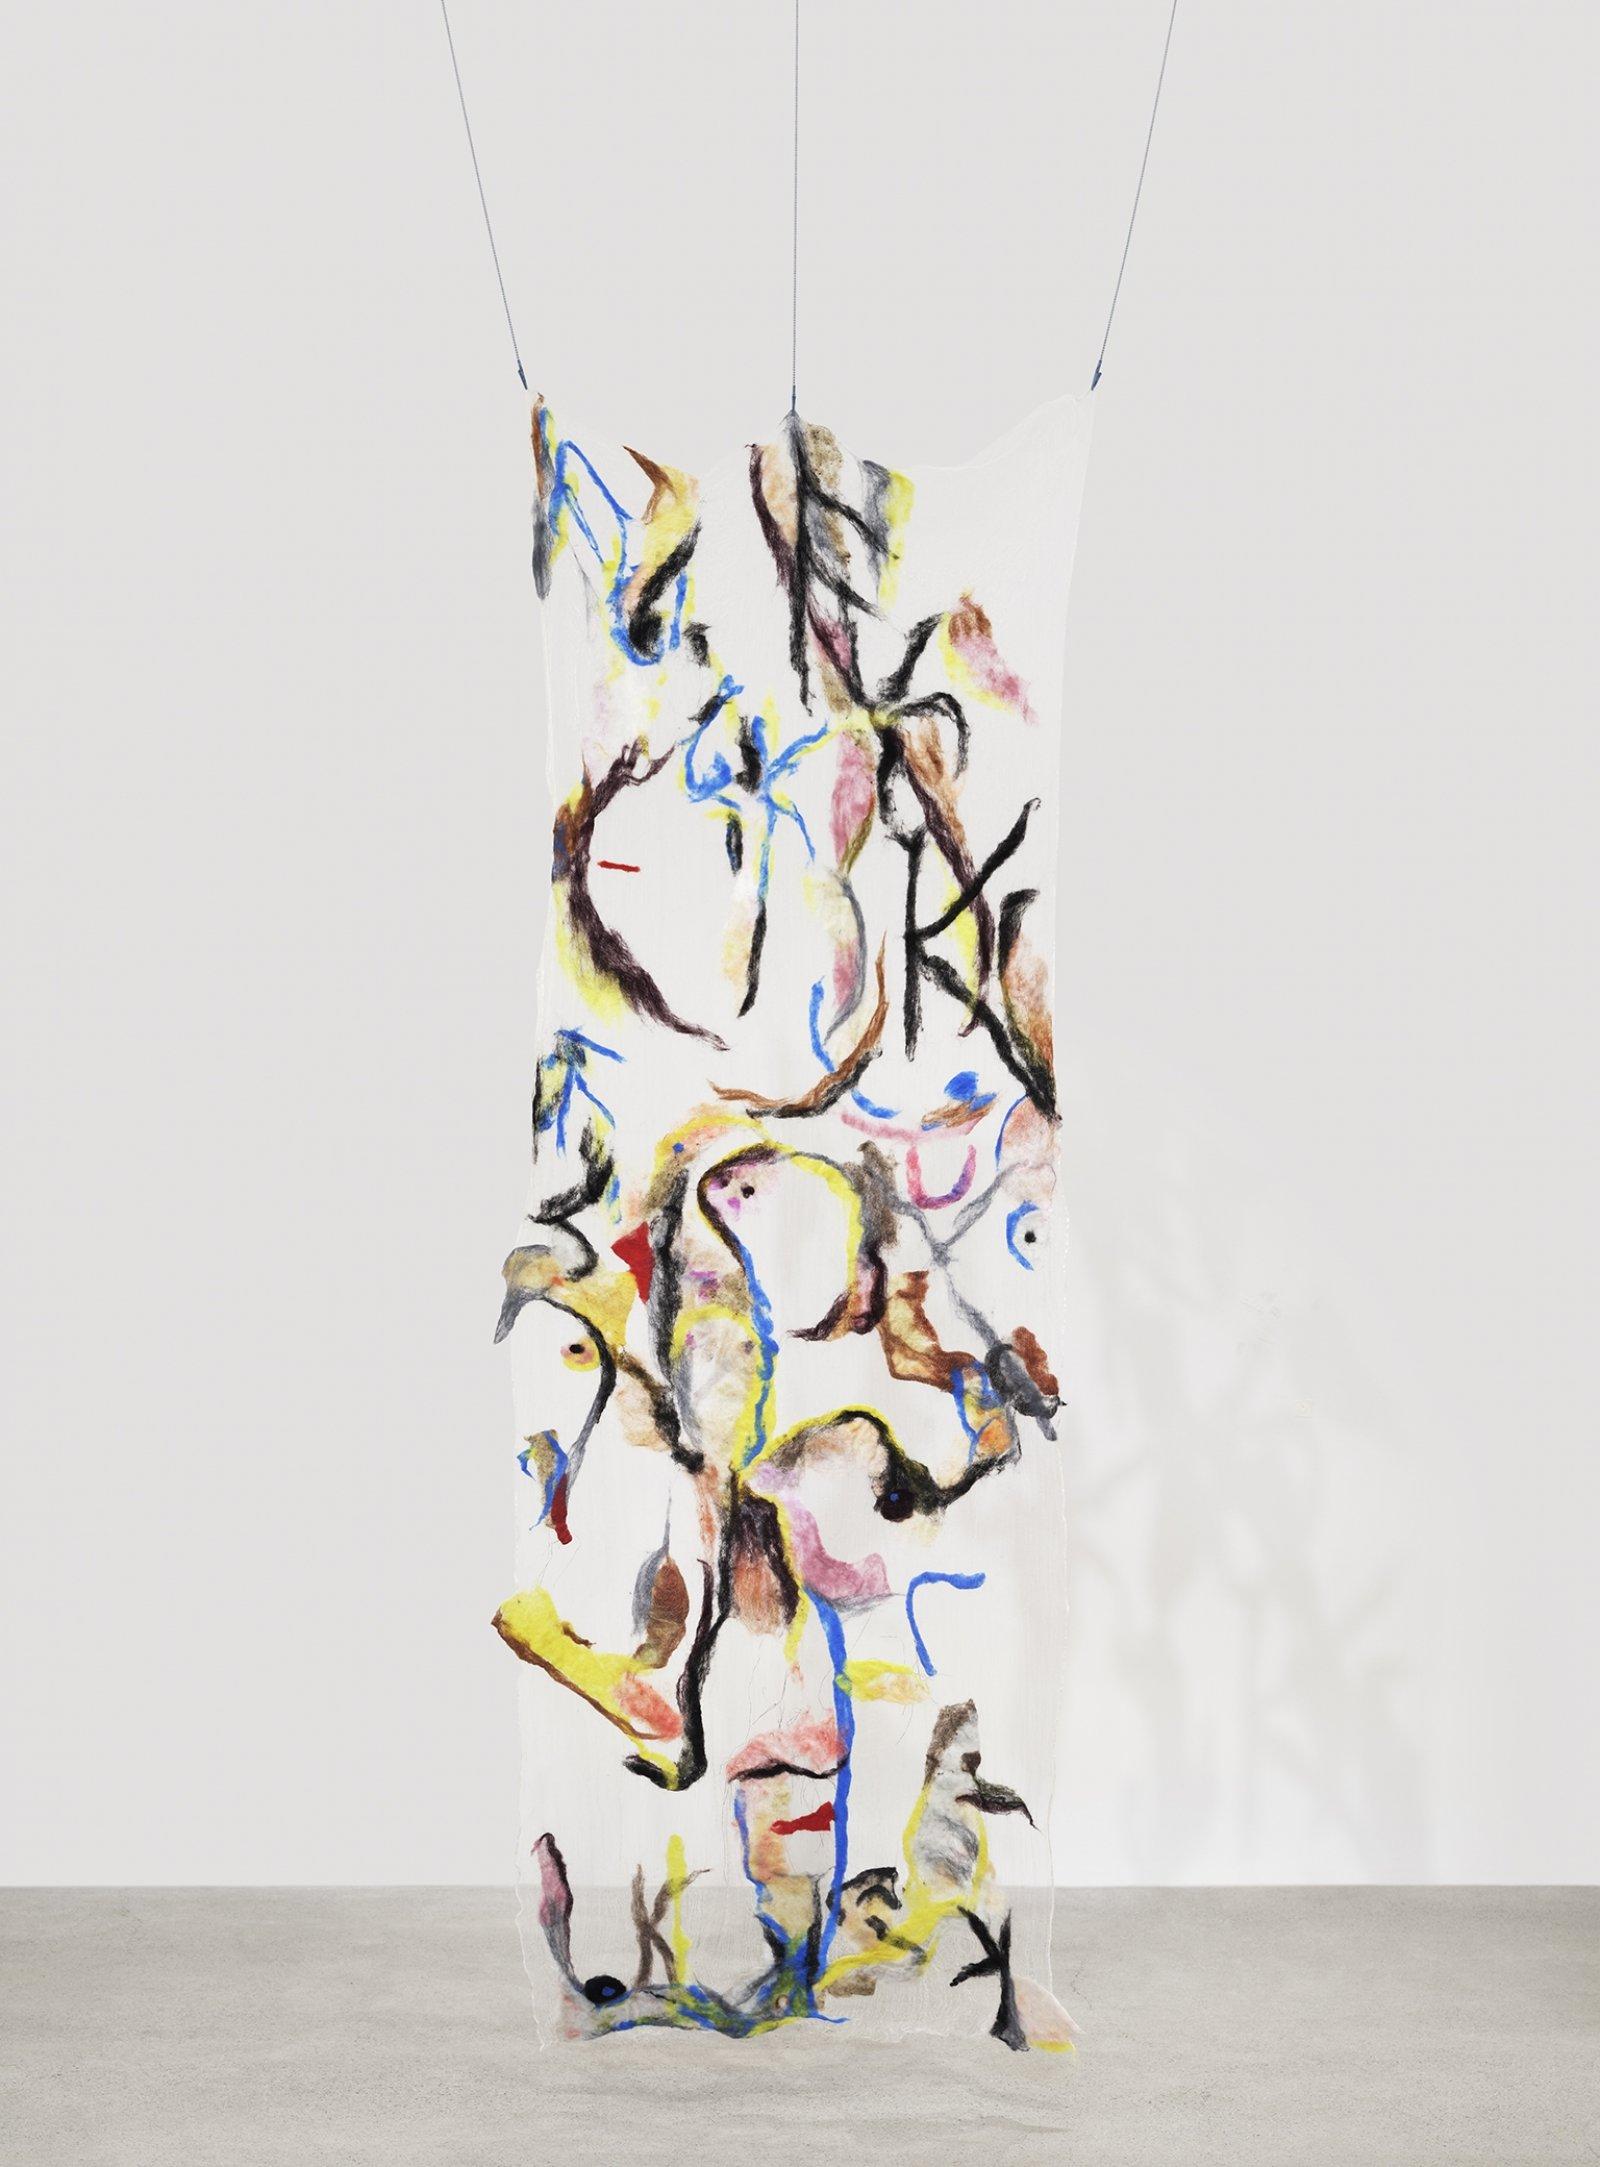 Rebecca Brewer, Scrim: Mayhem, 2019, silk, wool, ball chain, alligator clips, hooks, 107 x 39 in. (272 x 99 cm)